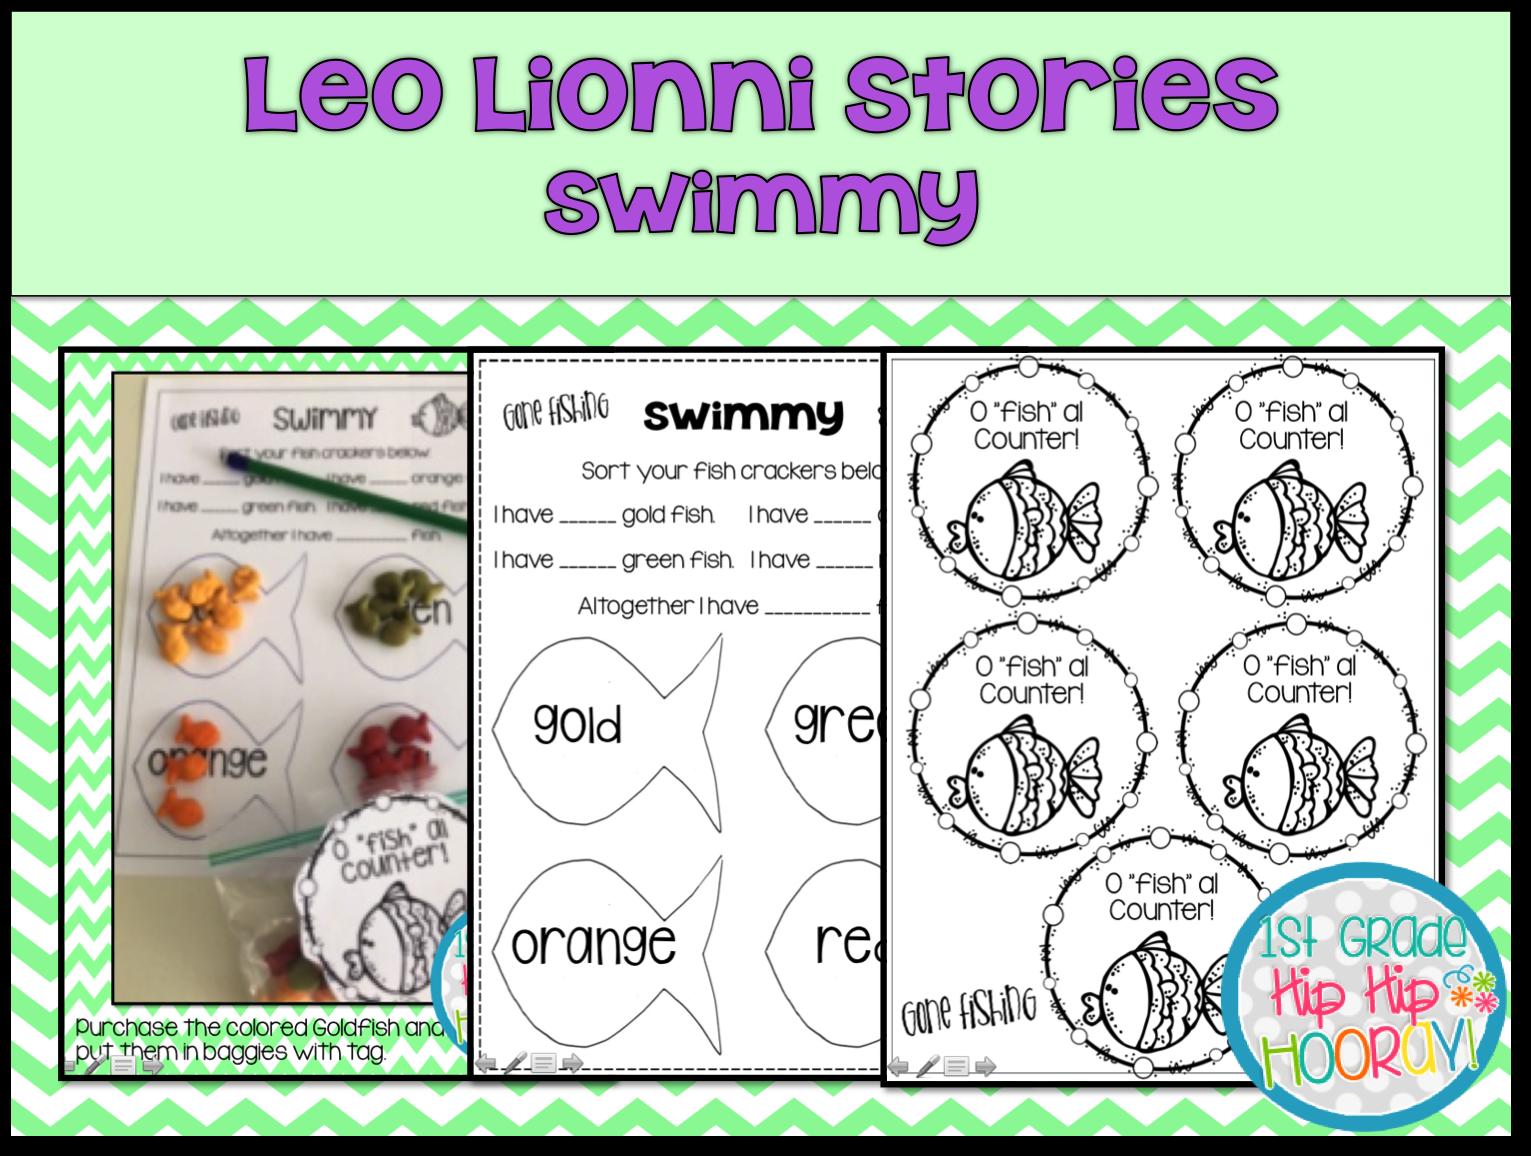 1st Grade Hip Hip Hooray Leo Lionni Author Study And More